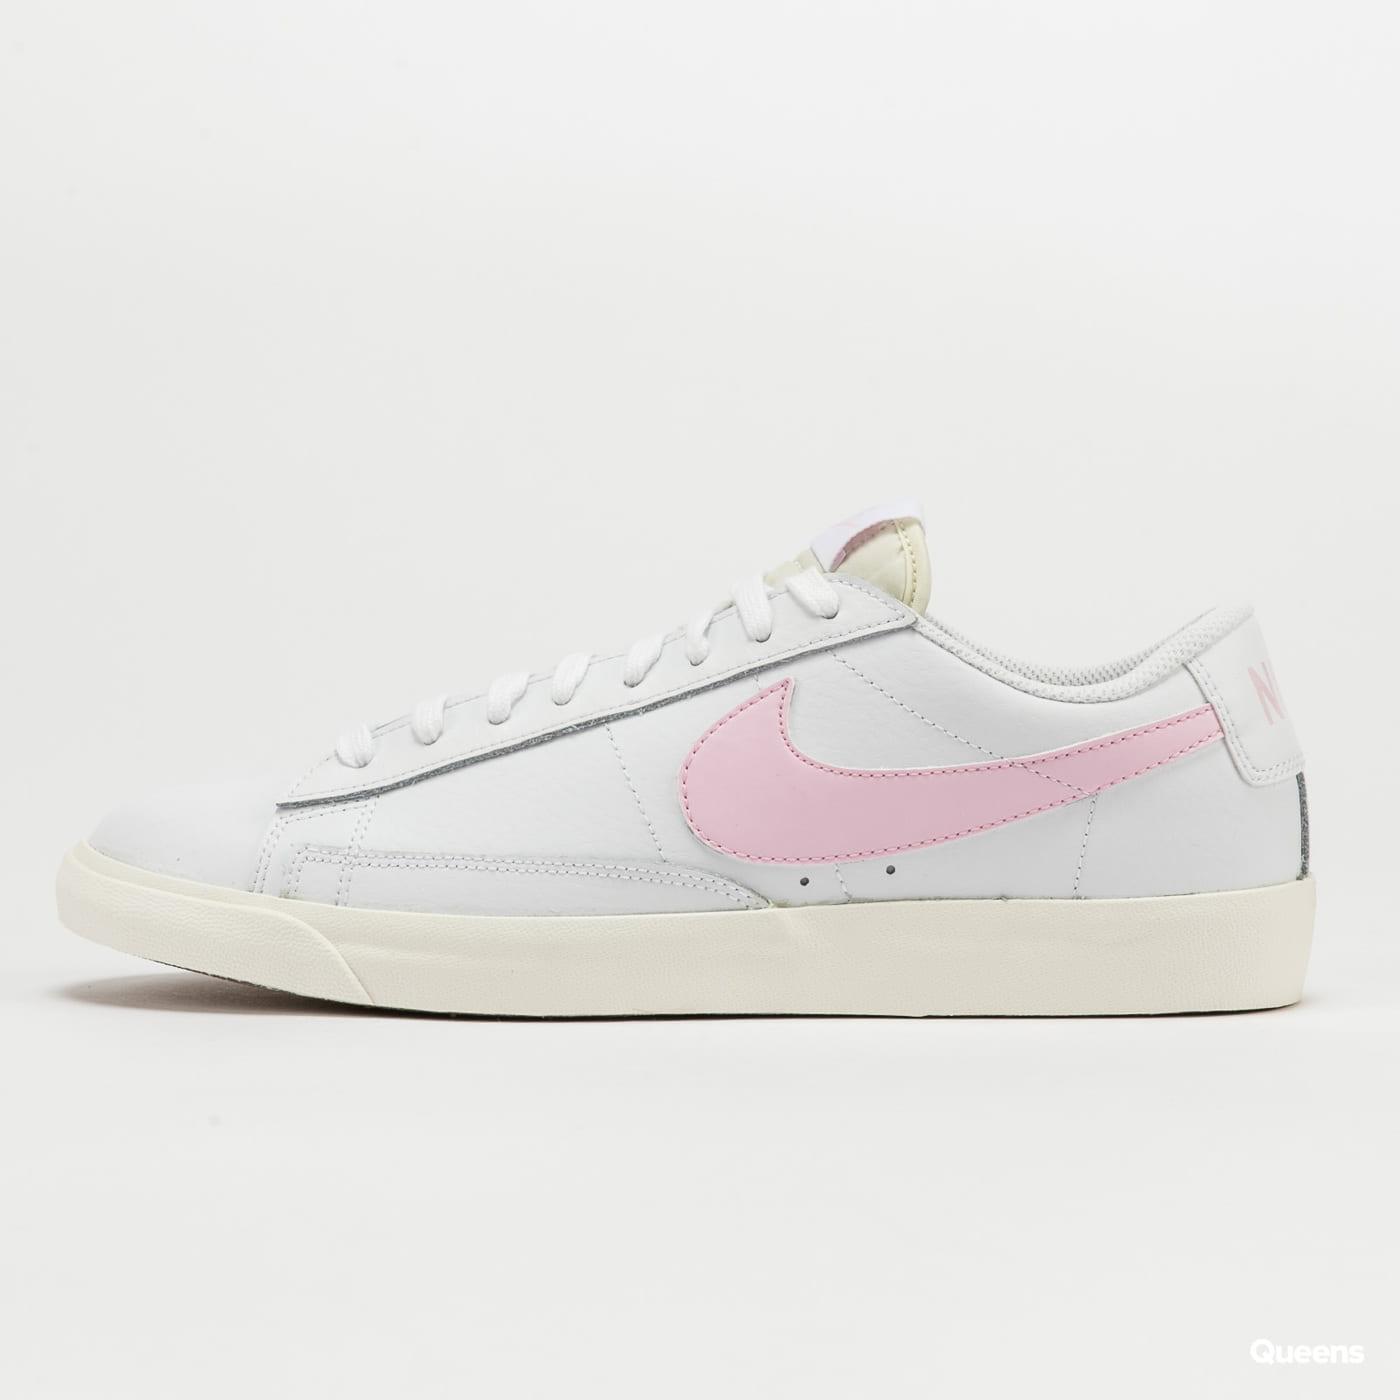 Nike Blazer Low Leather white / pink foam - sail